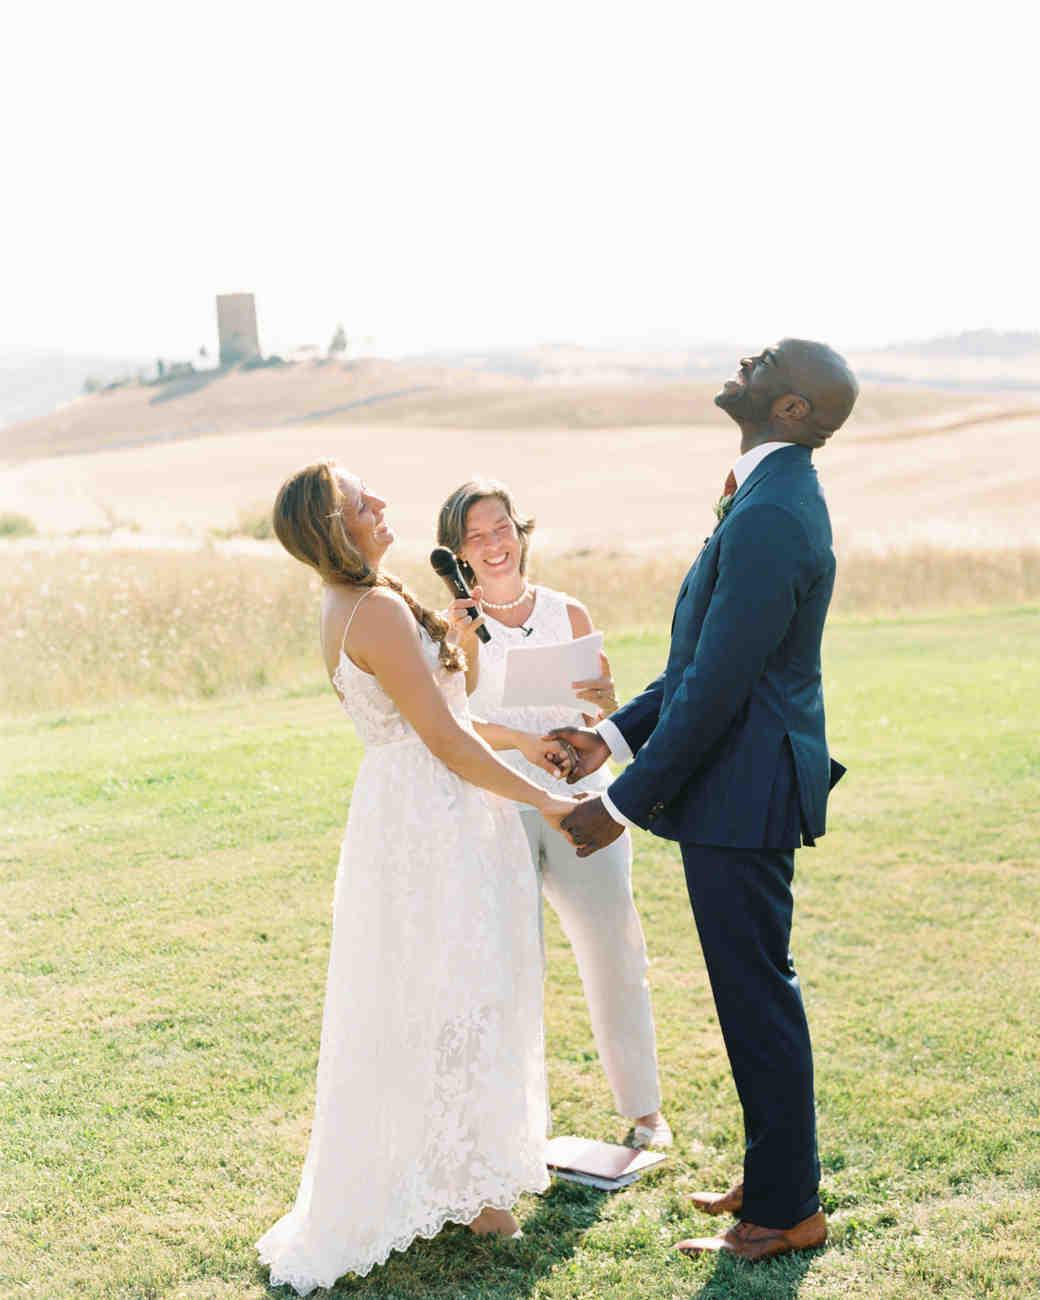 leila joel wedding ceremony vows